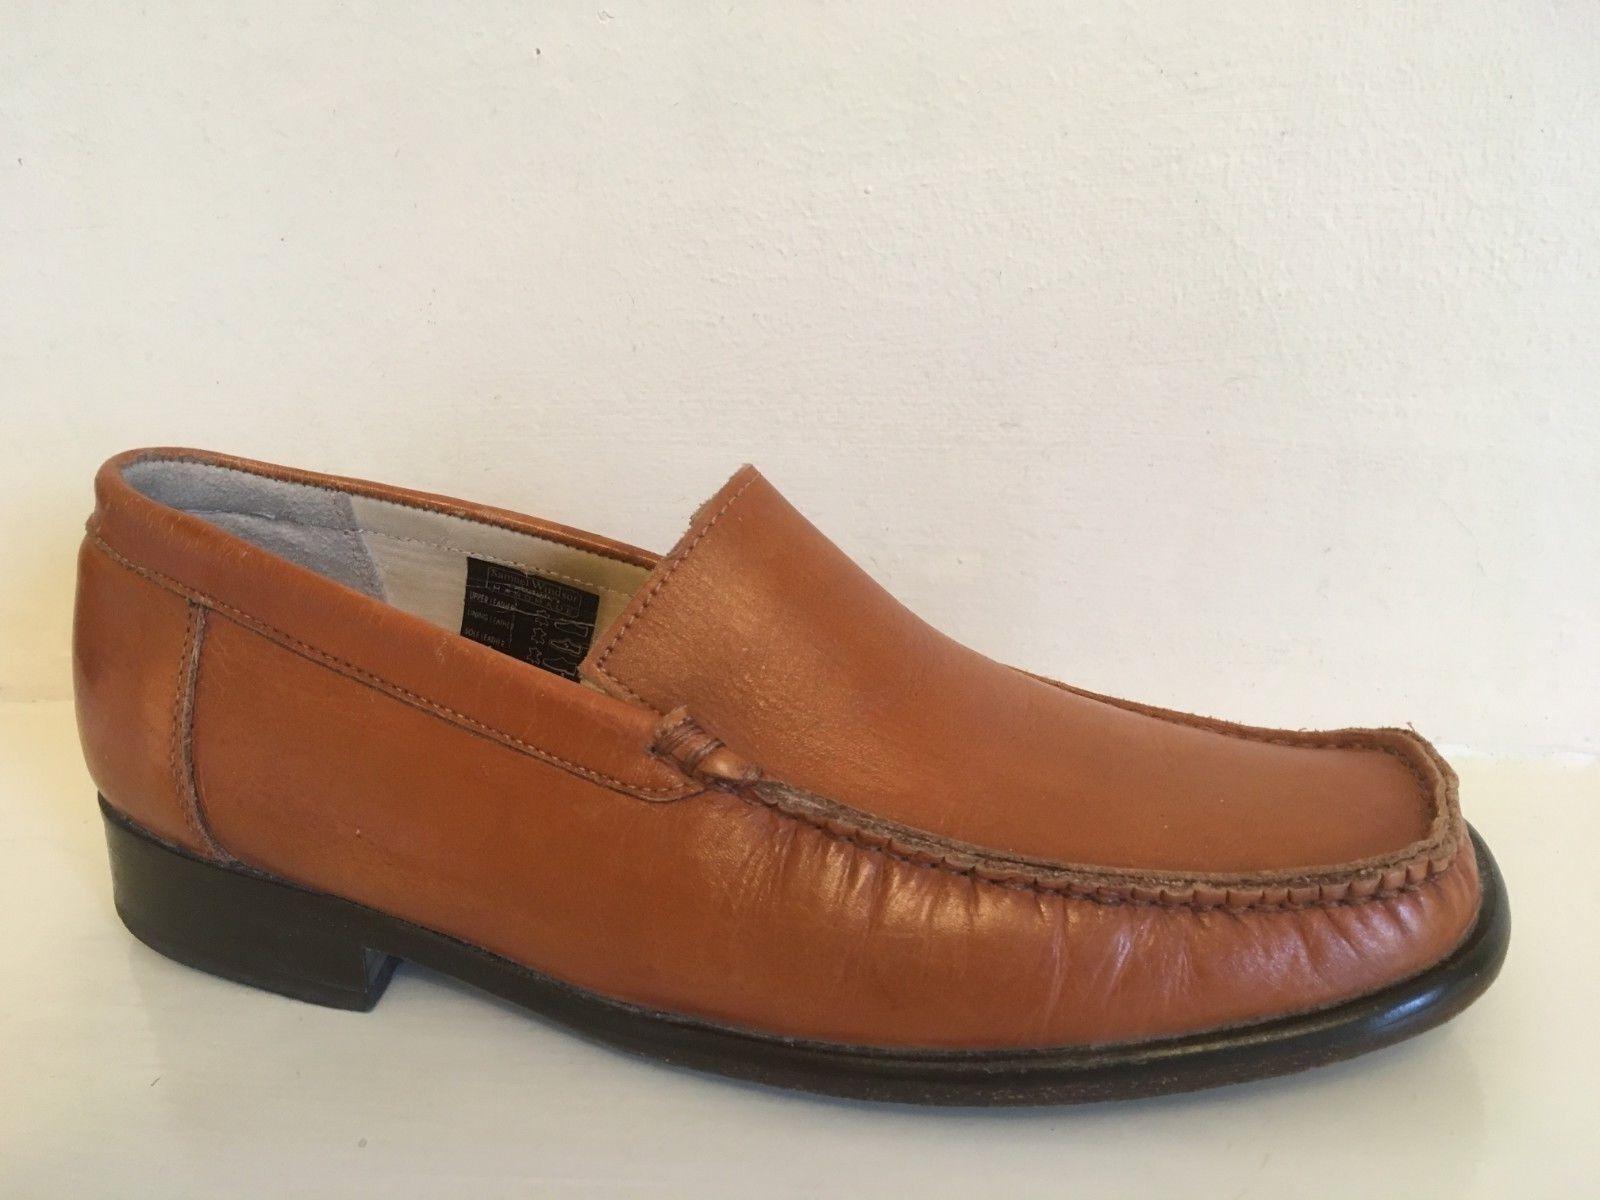 SchöN Mens Bnwob Sole 2 Sole Brown Slip On Shoes Size Eu 40 Kleidung & Accessoires Herrenschuhe